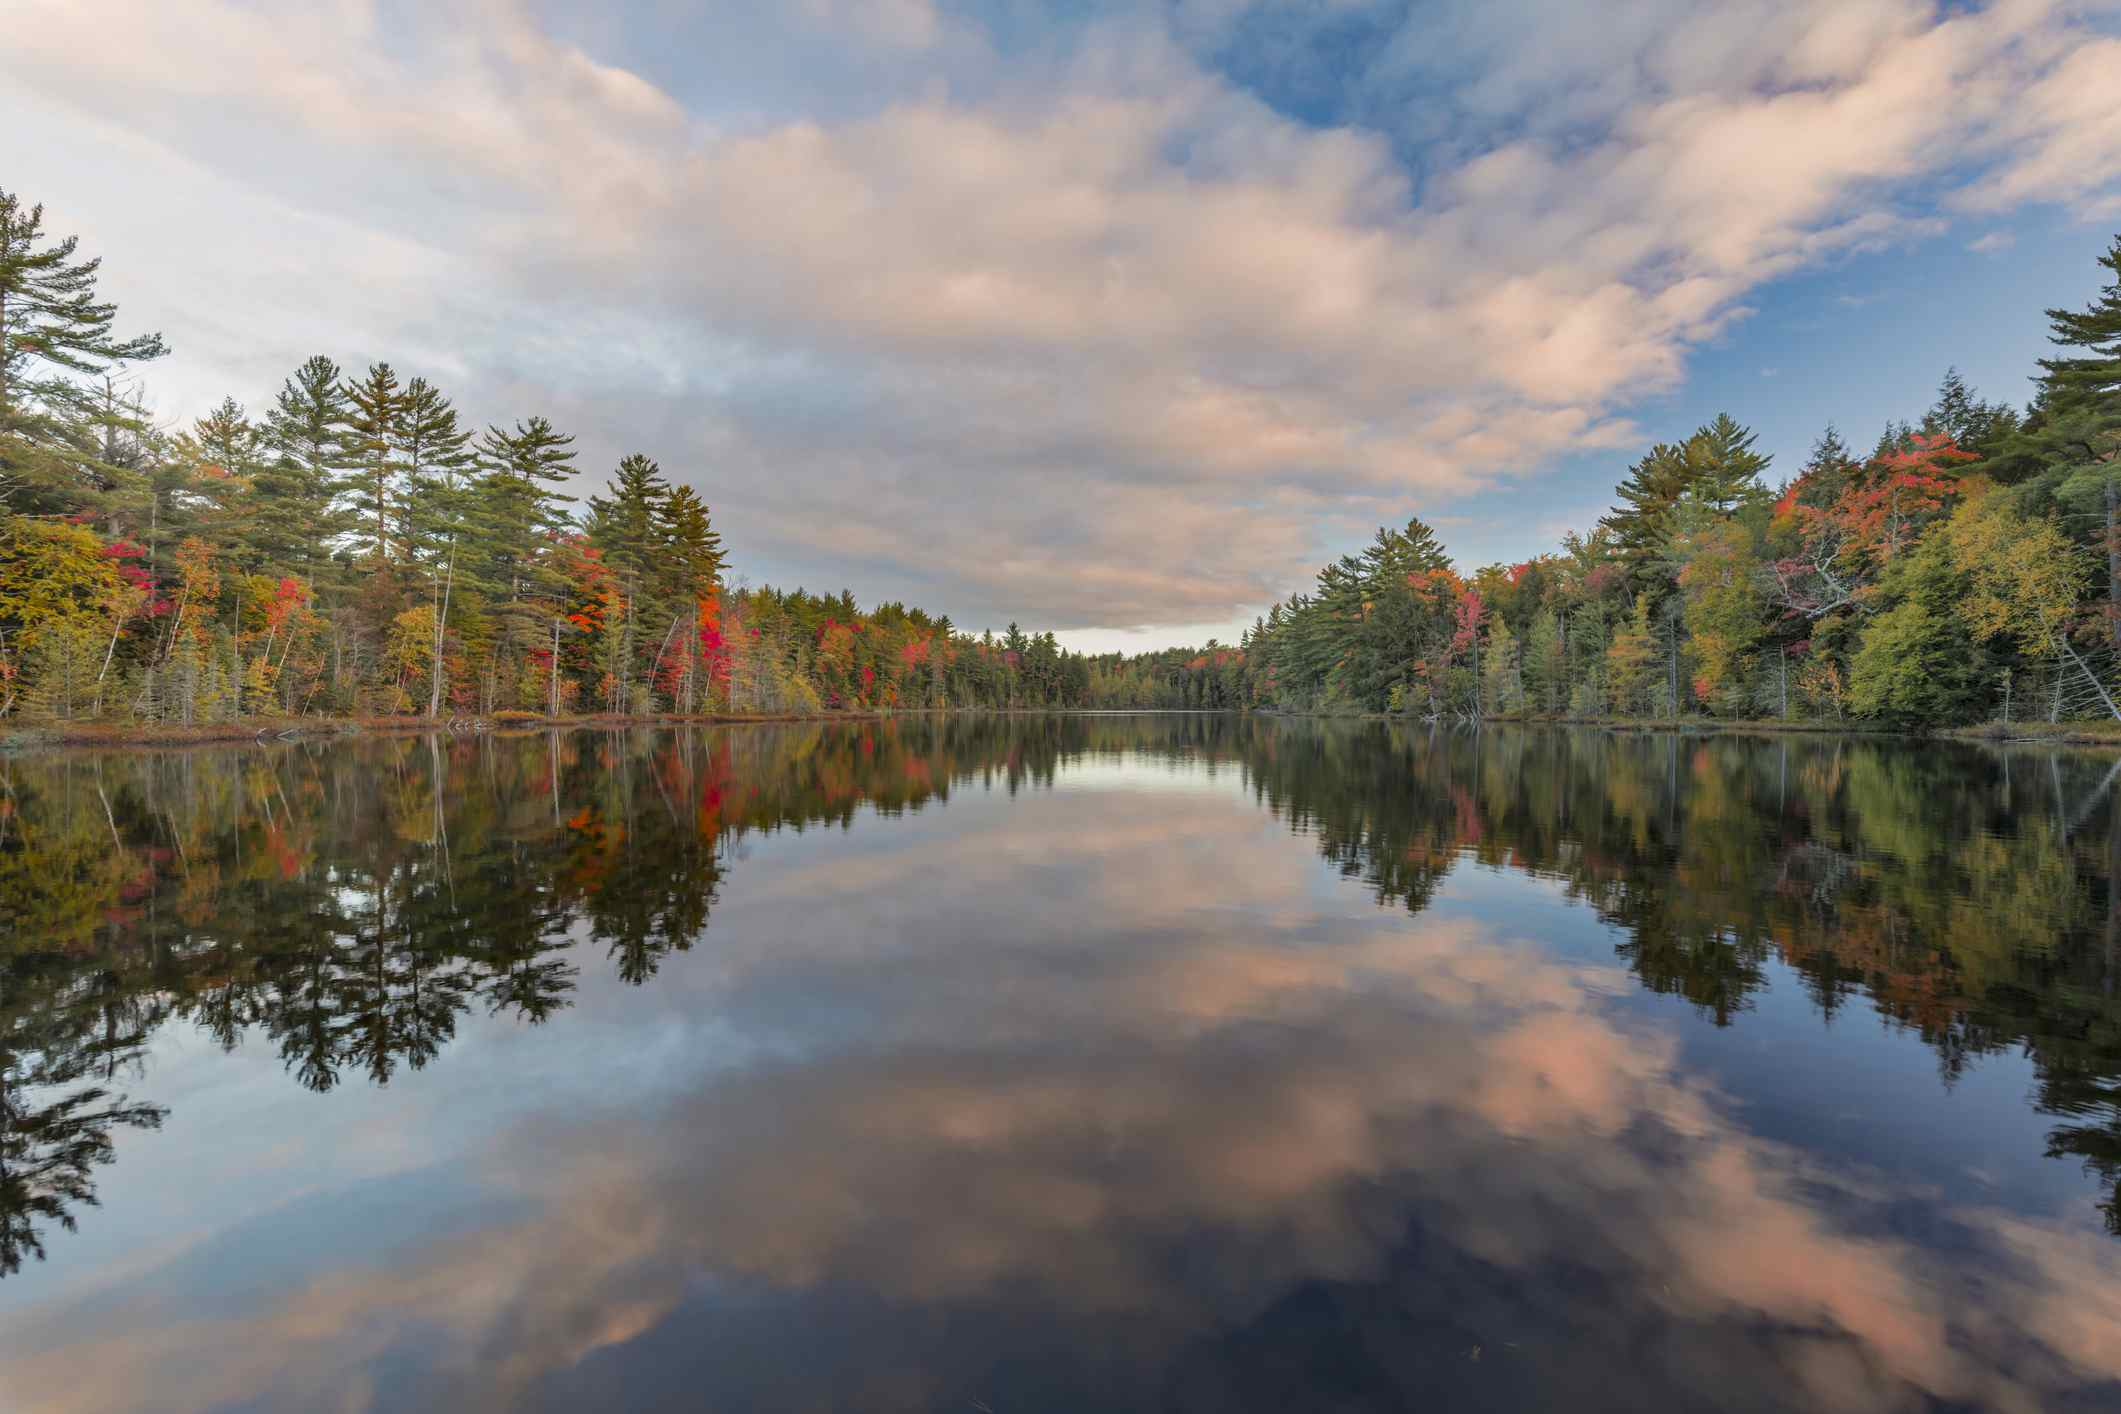 Hiawatha National Forest in Michigan